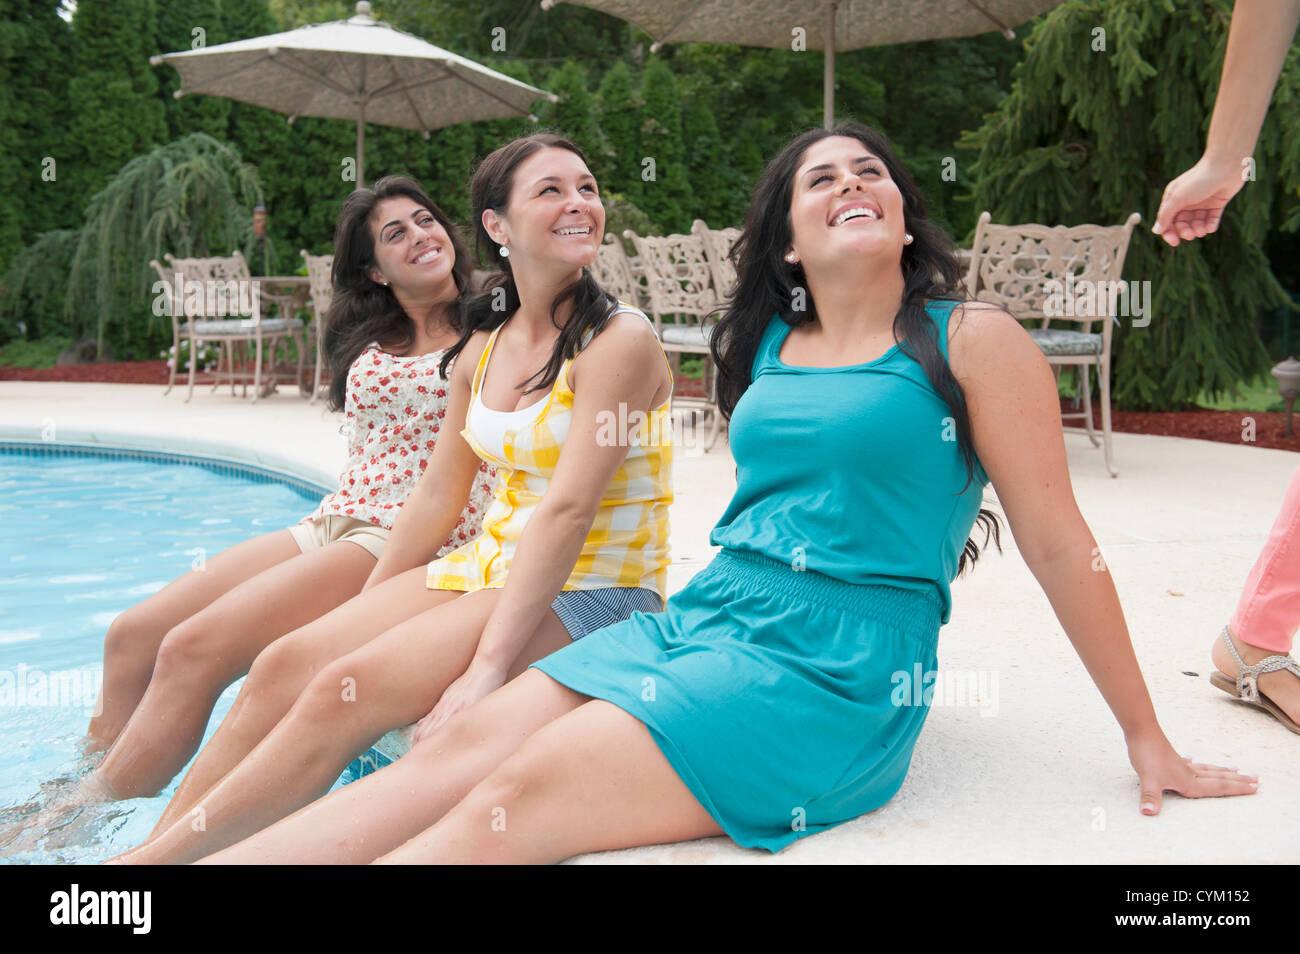 Women Dangling Feet In Swimming Pool Stock Photo Royalty Free Image 51456414 Alamy